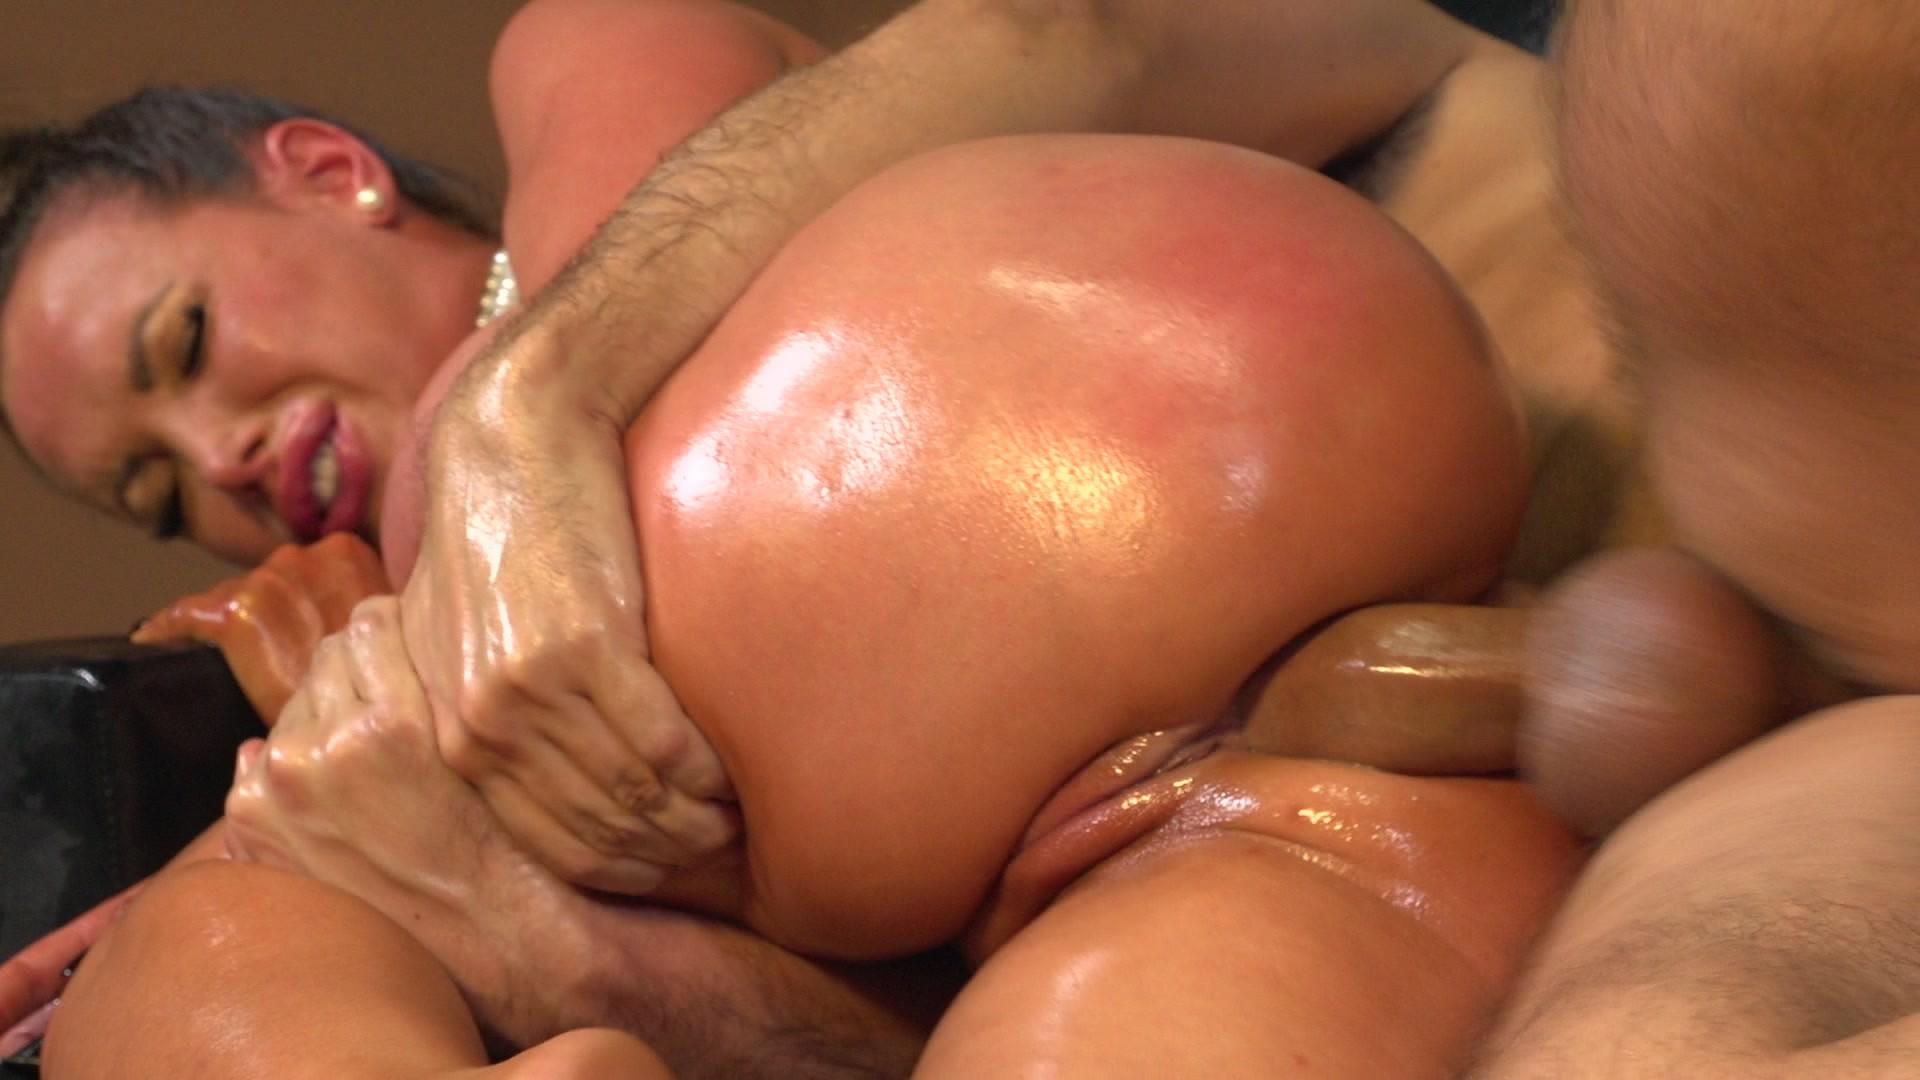 Nikki benz fucking sex gifs, www xxx video image com